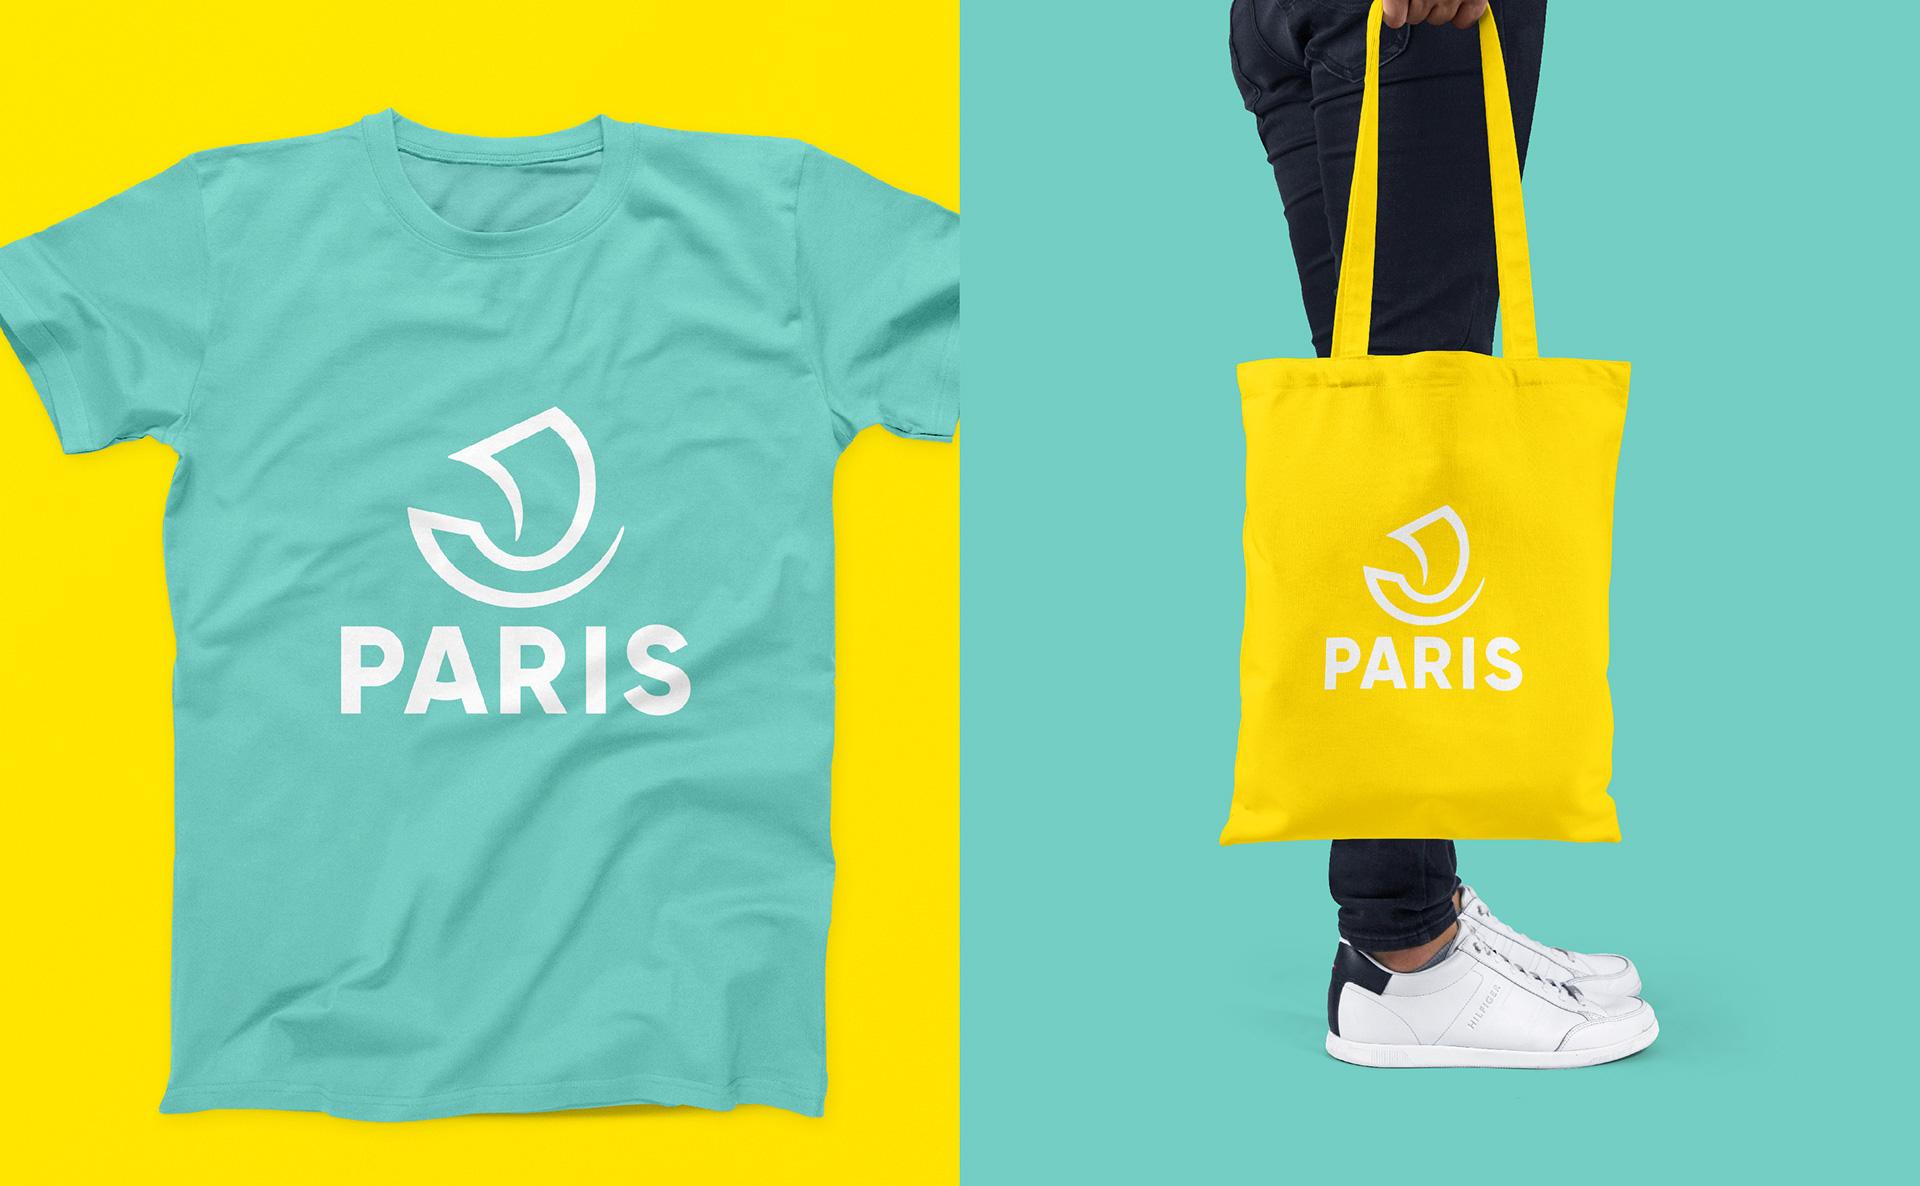 city_of_paris_tshirt_tote Il nuovo logo di Parigi